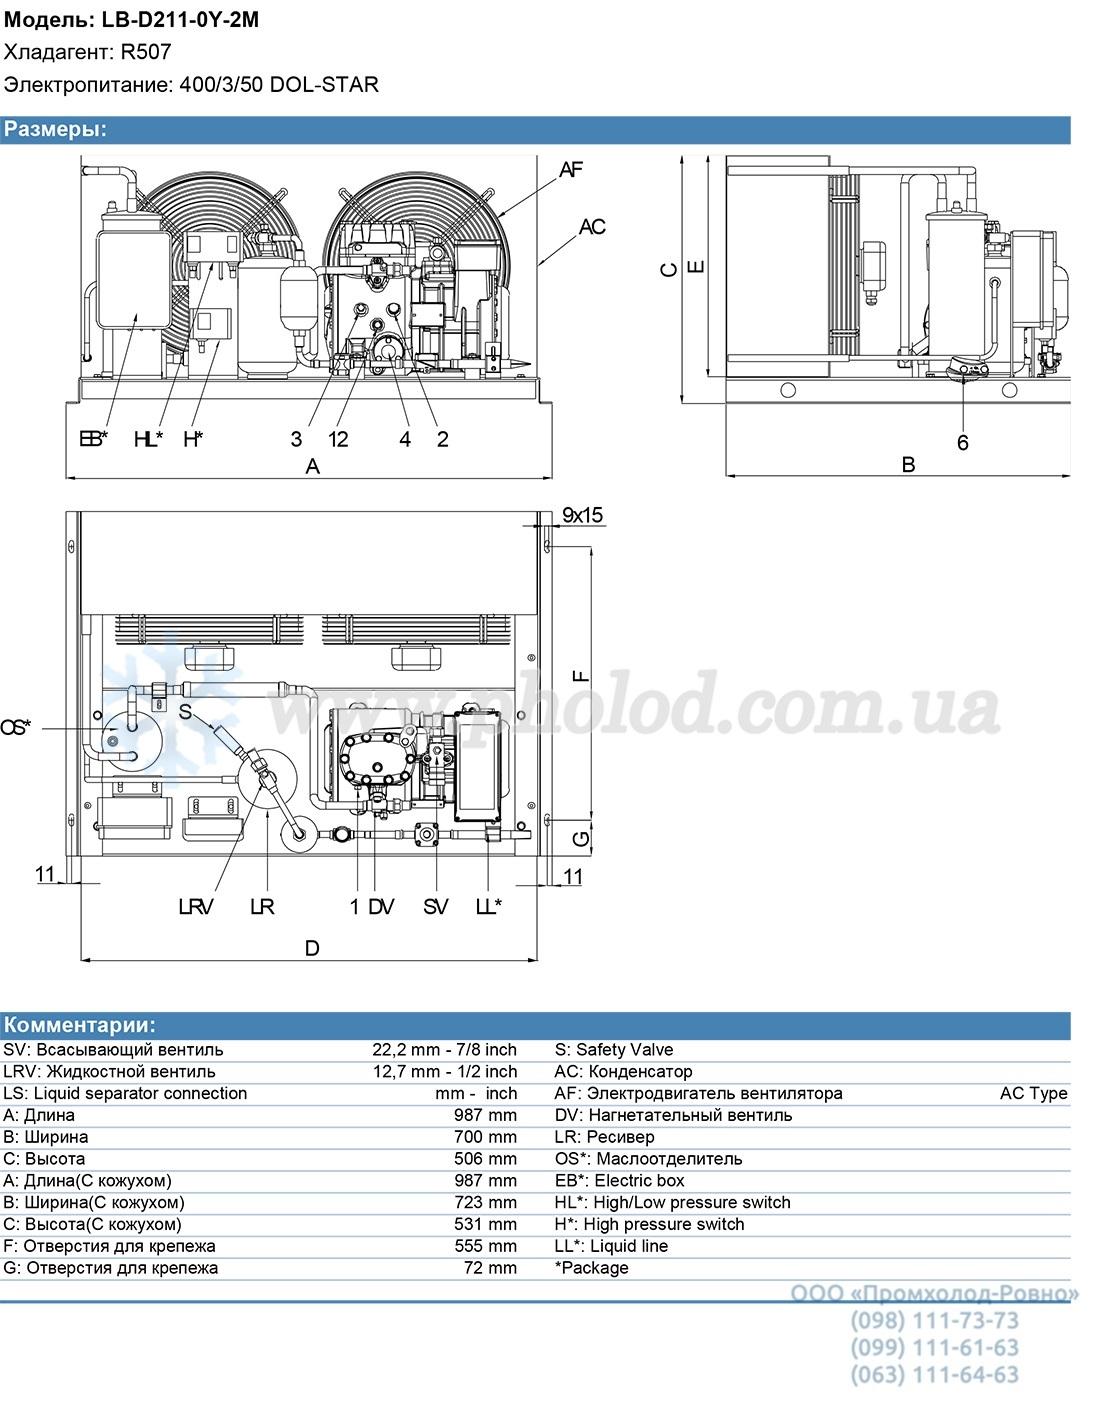 LB-D211-0Y-2M 3